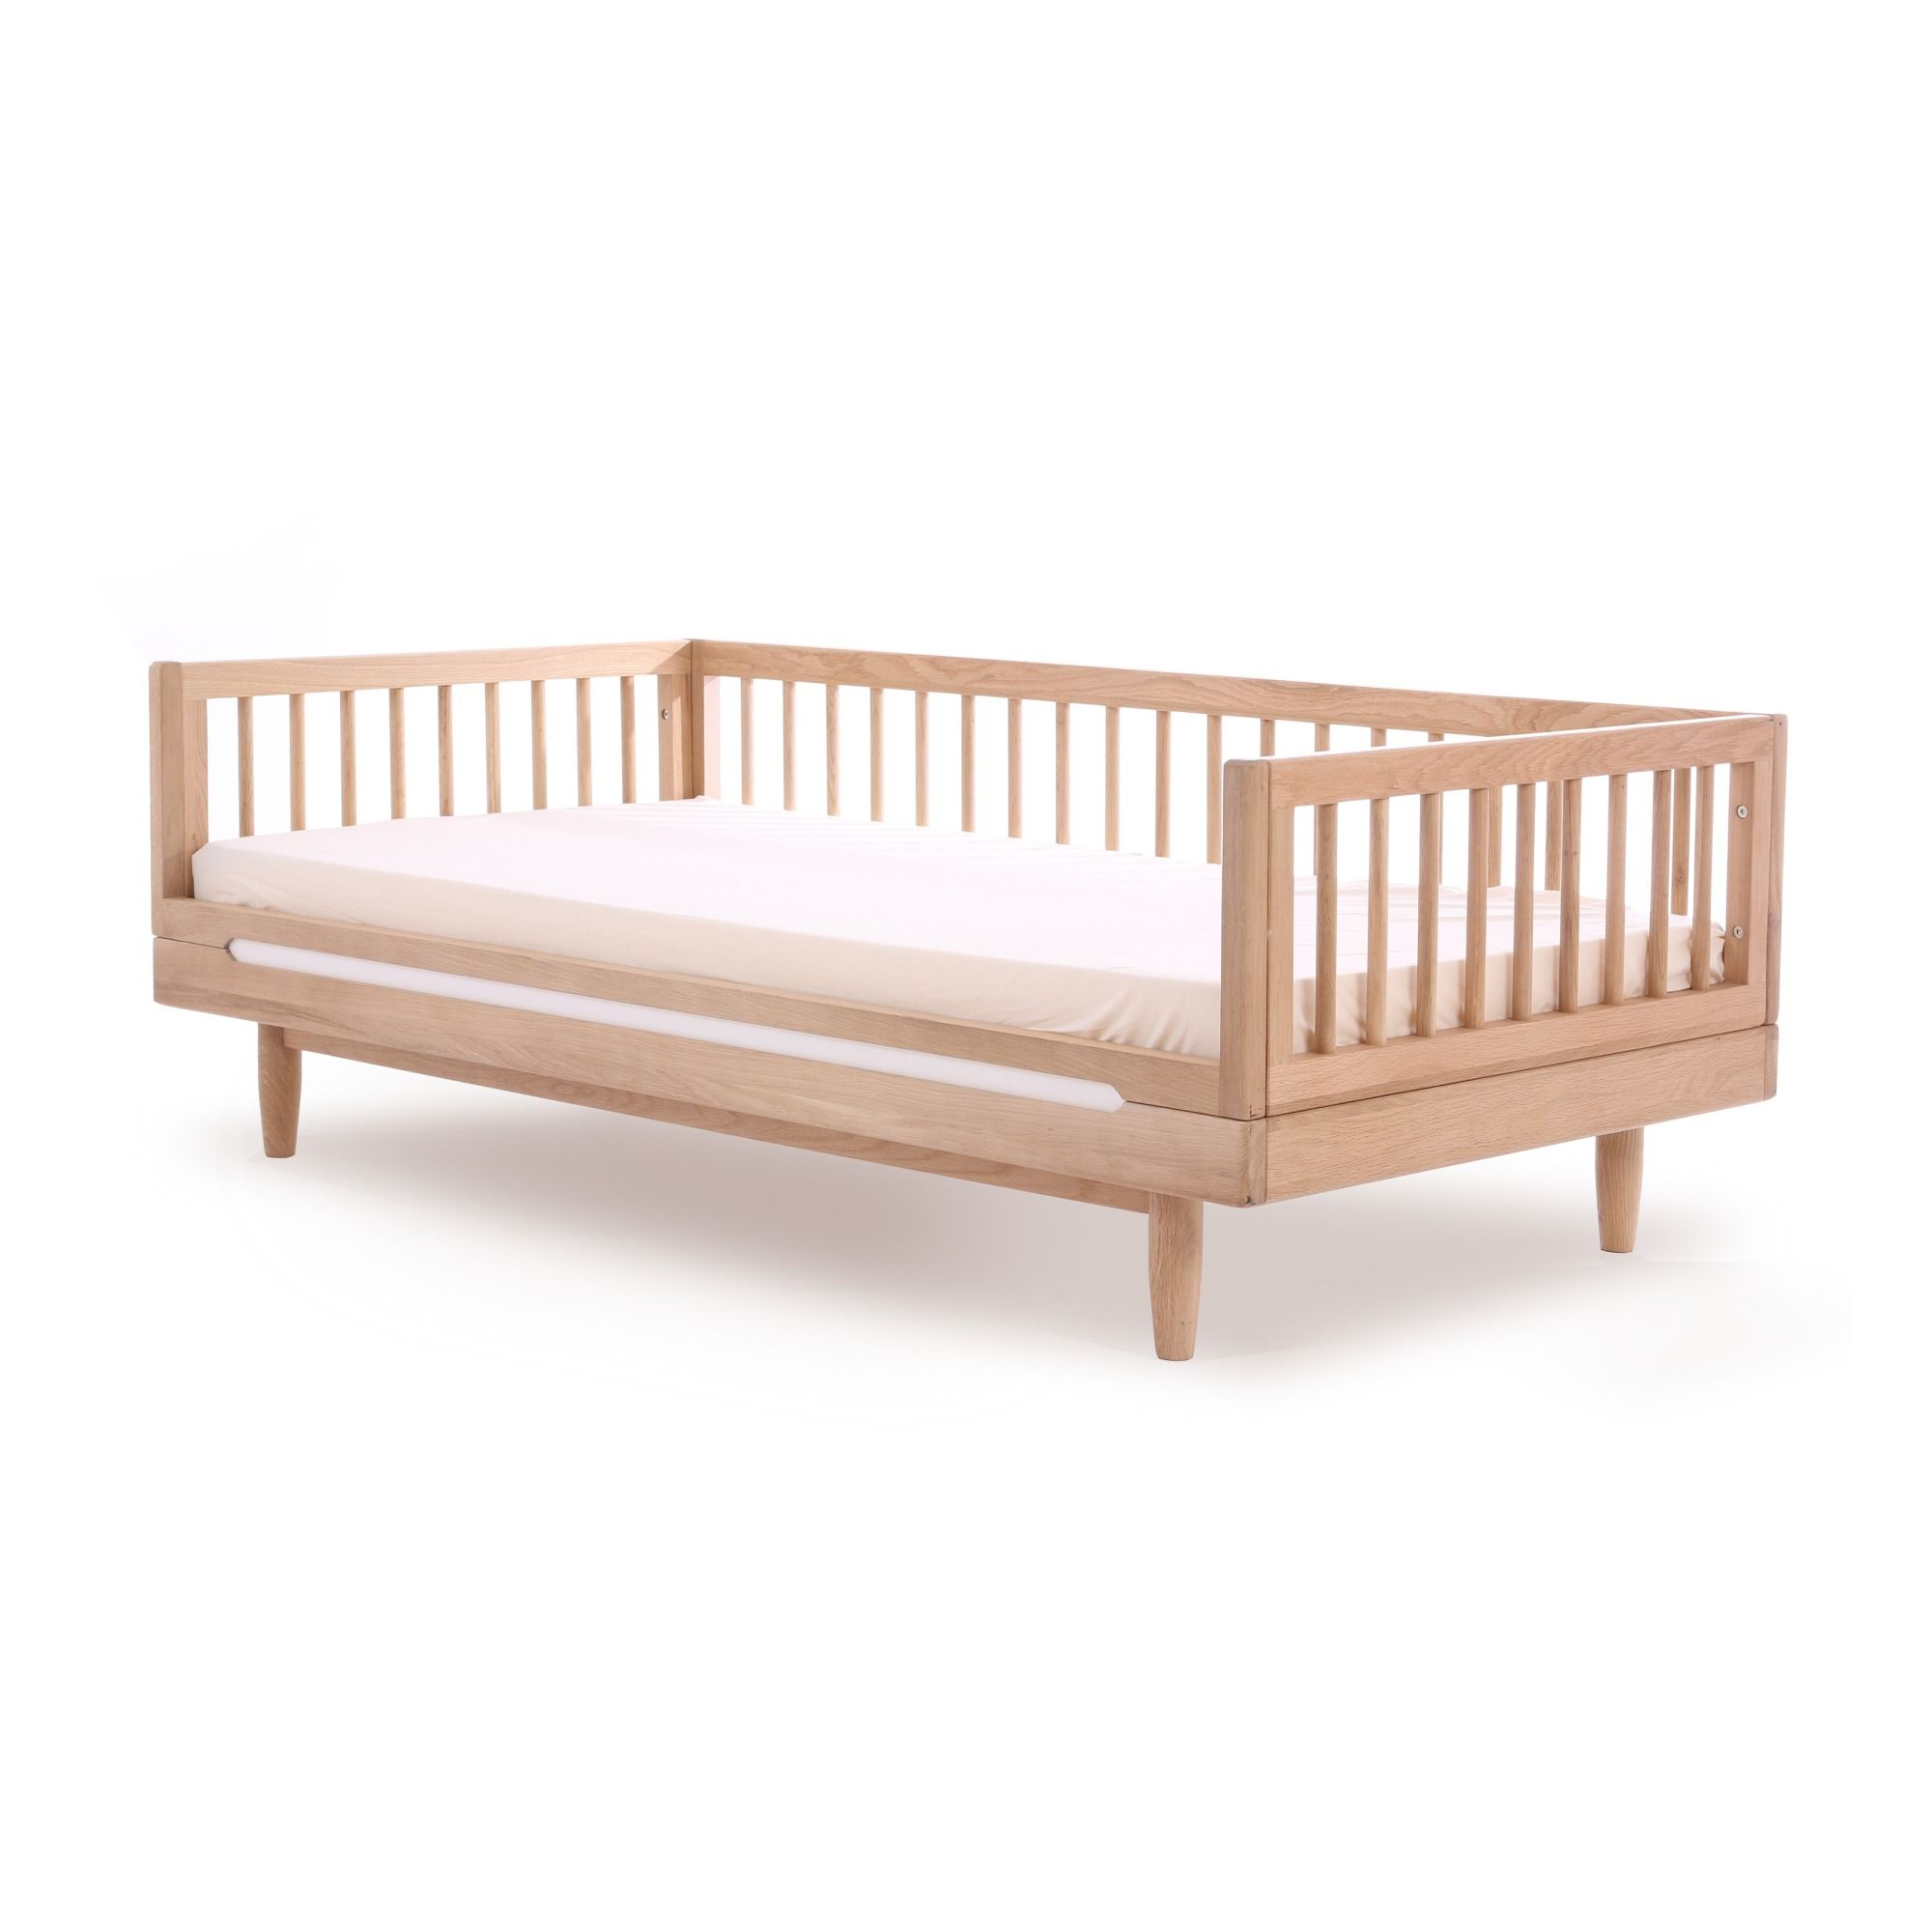 Pure Junior Bed 70x140 Cm Oak Junior Bed Bed Bed Furniture